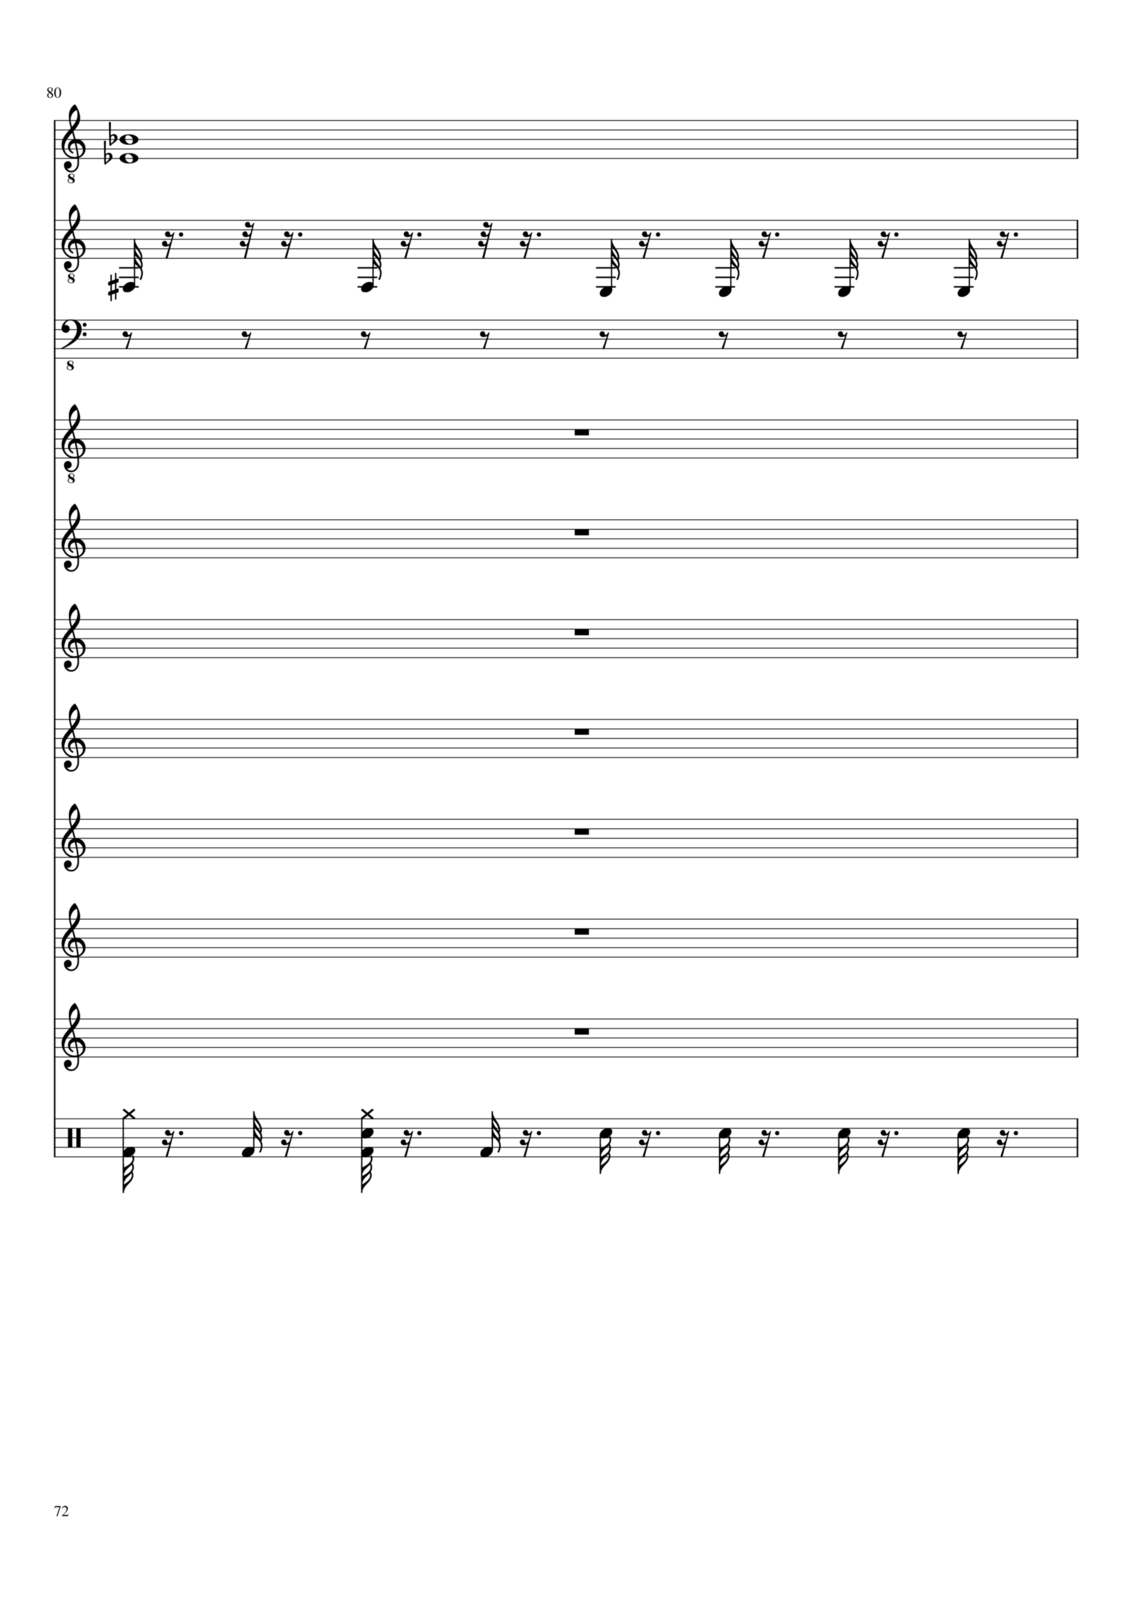 Belyiy sokol slide, Image 72